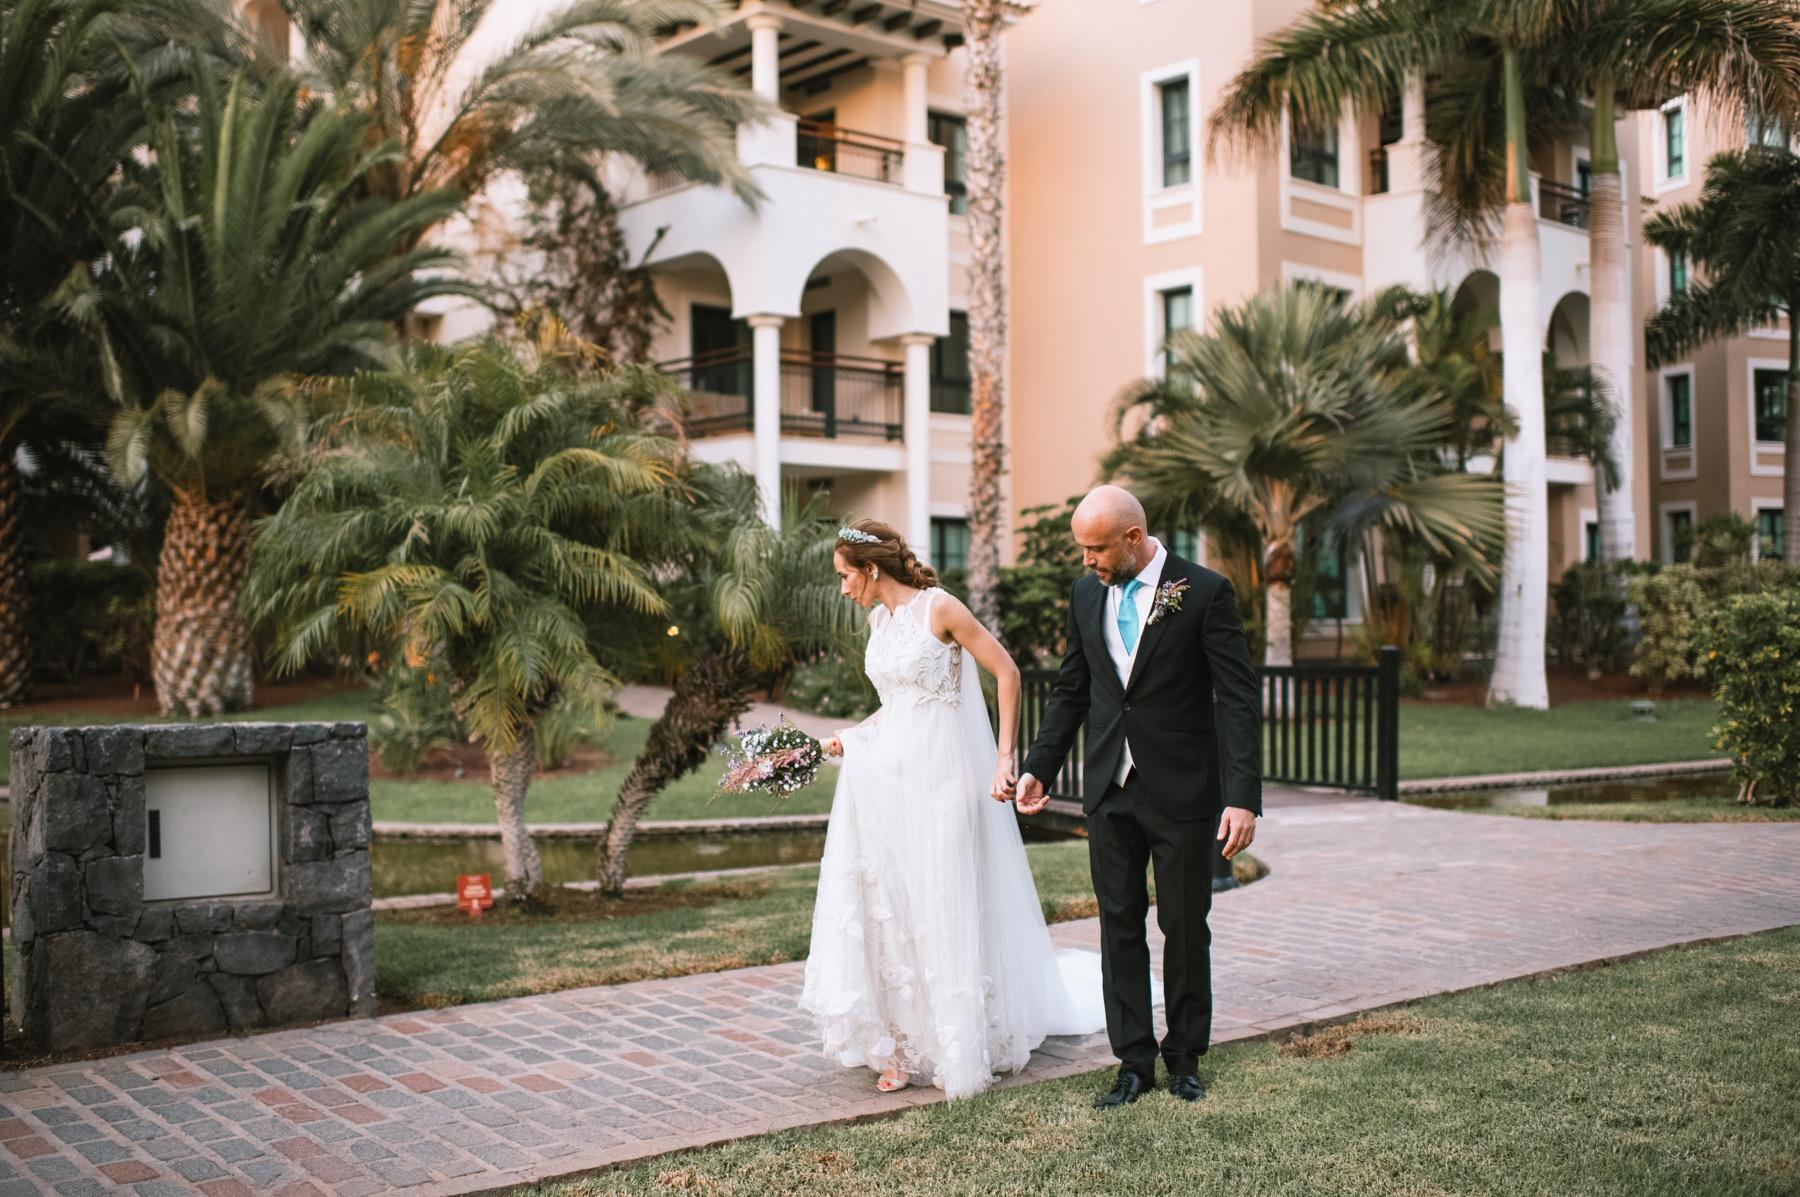 Luxury wedding Melia Guia de Isora Tenerife